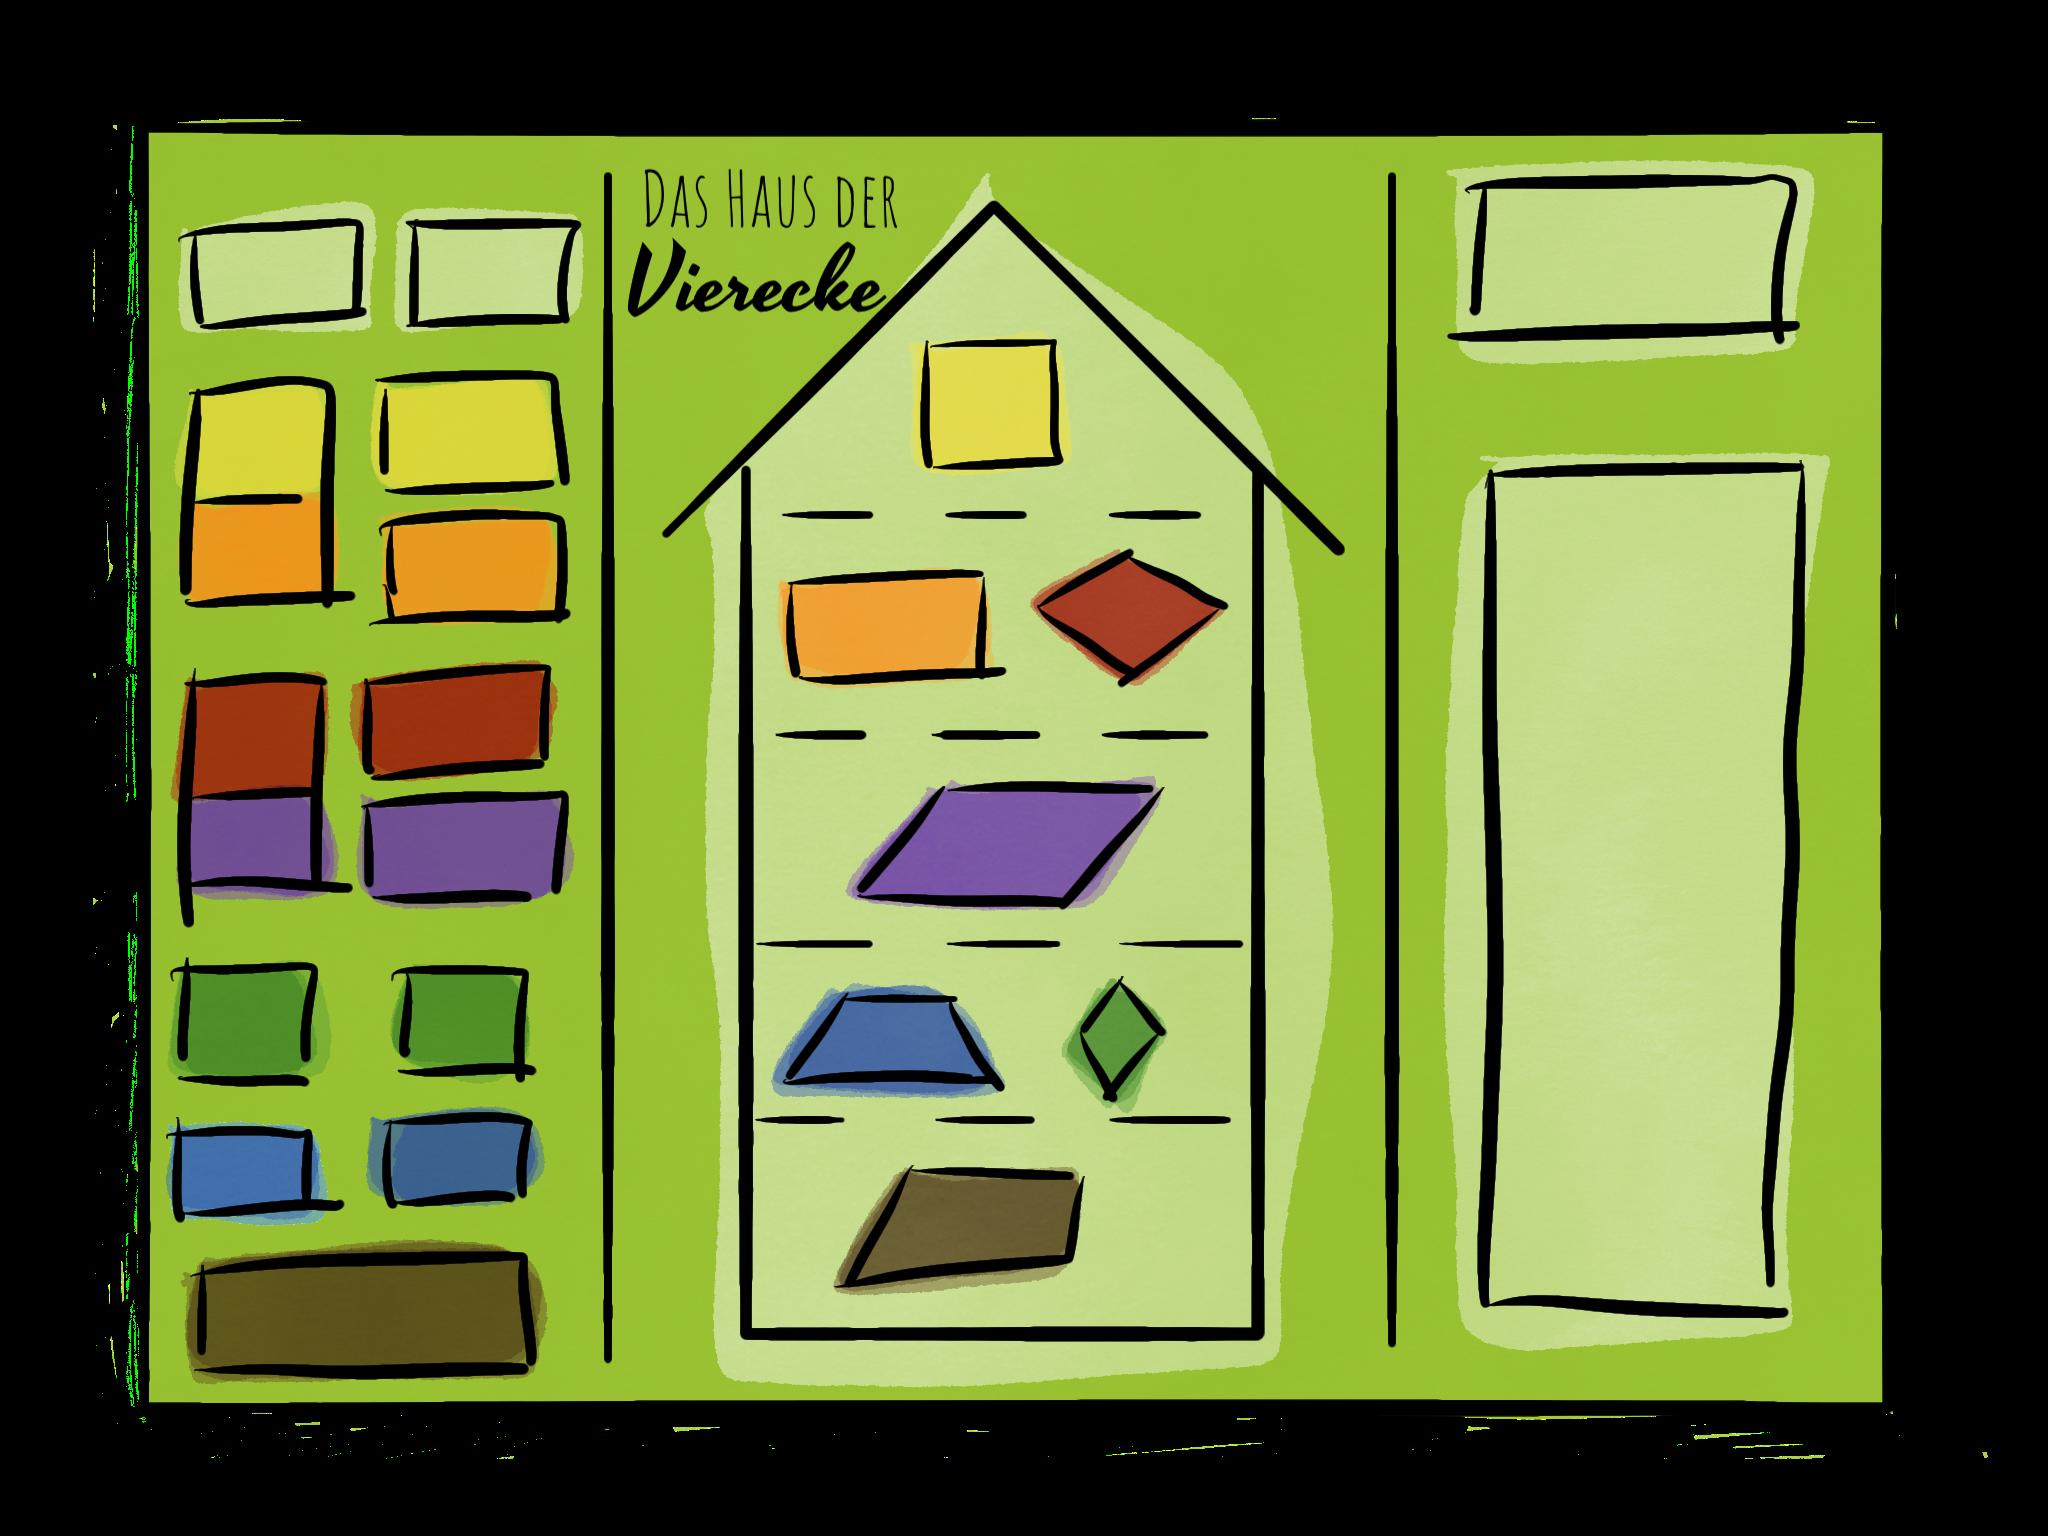 Ebene Figuren – Ein Geometrie-Lapbook